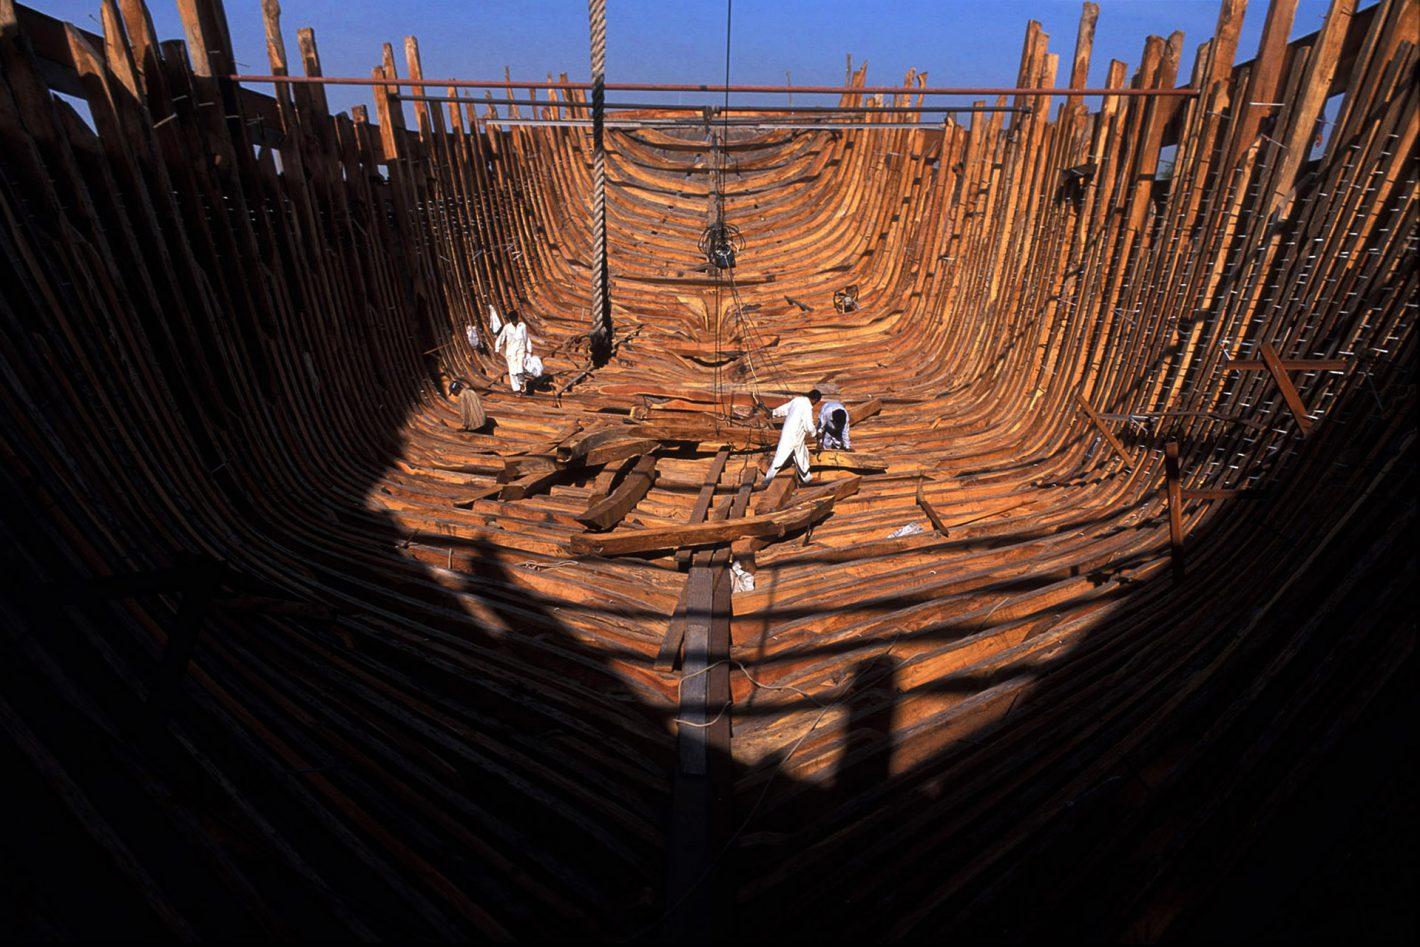 Nikon travail mer Laurent Charpentier